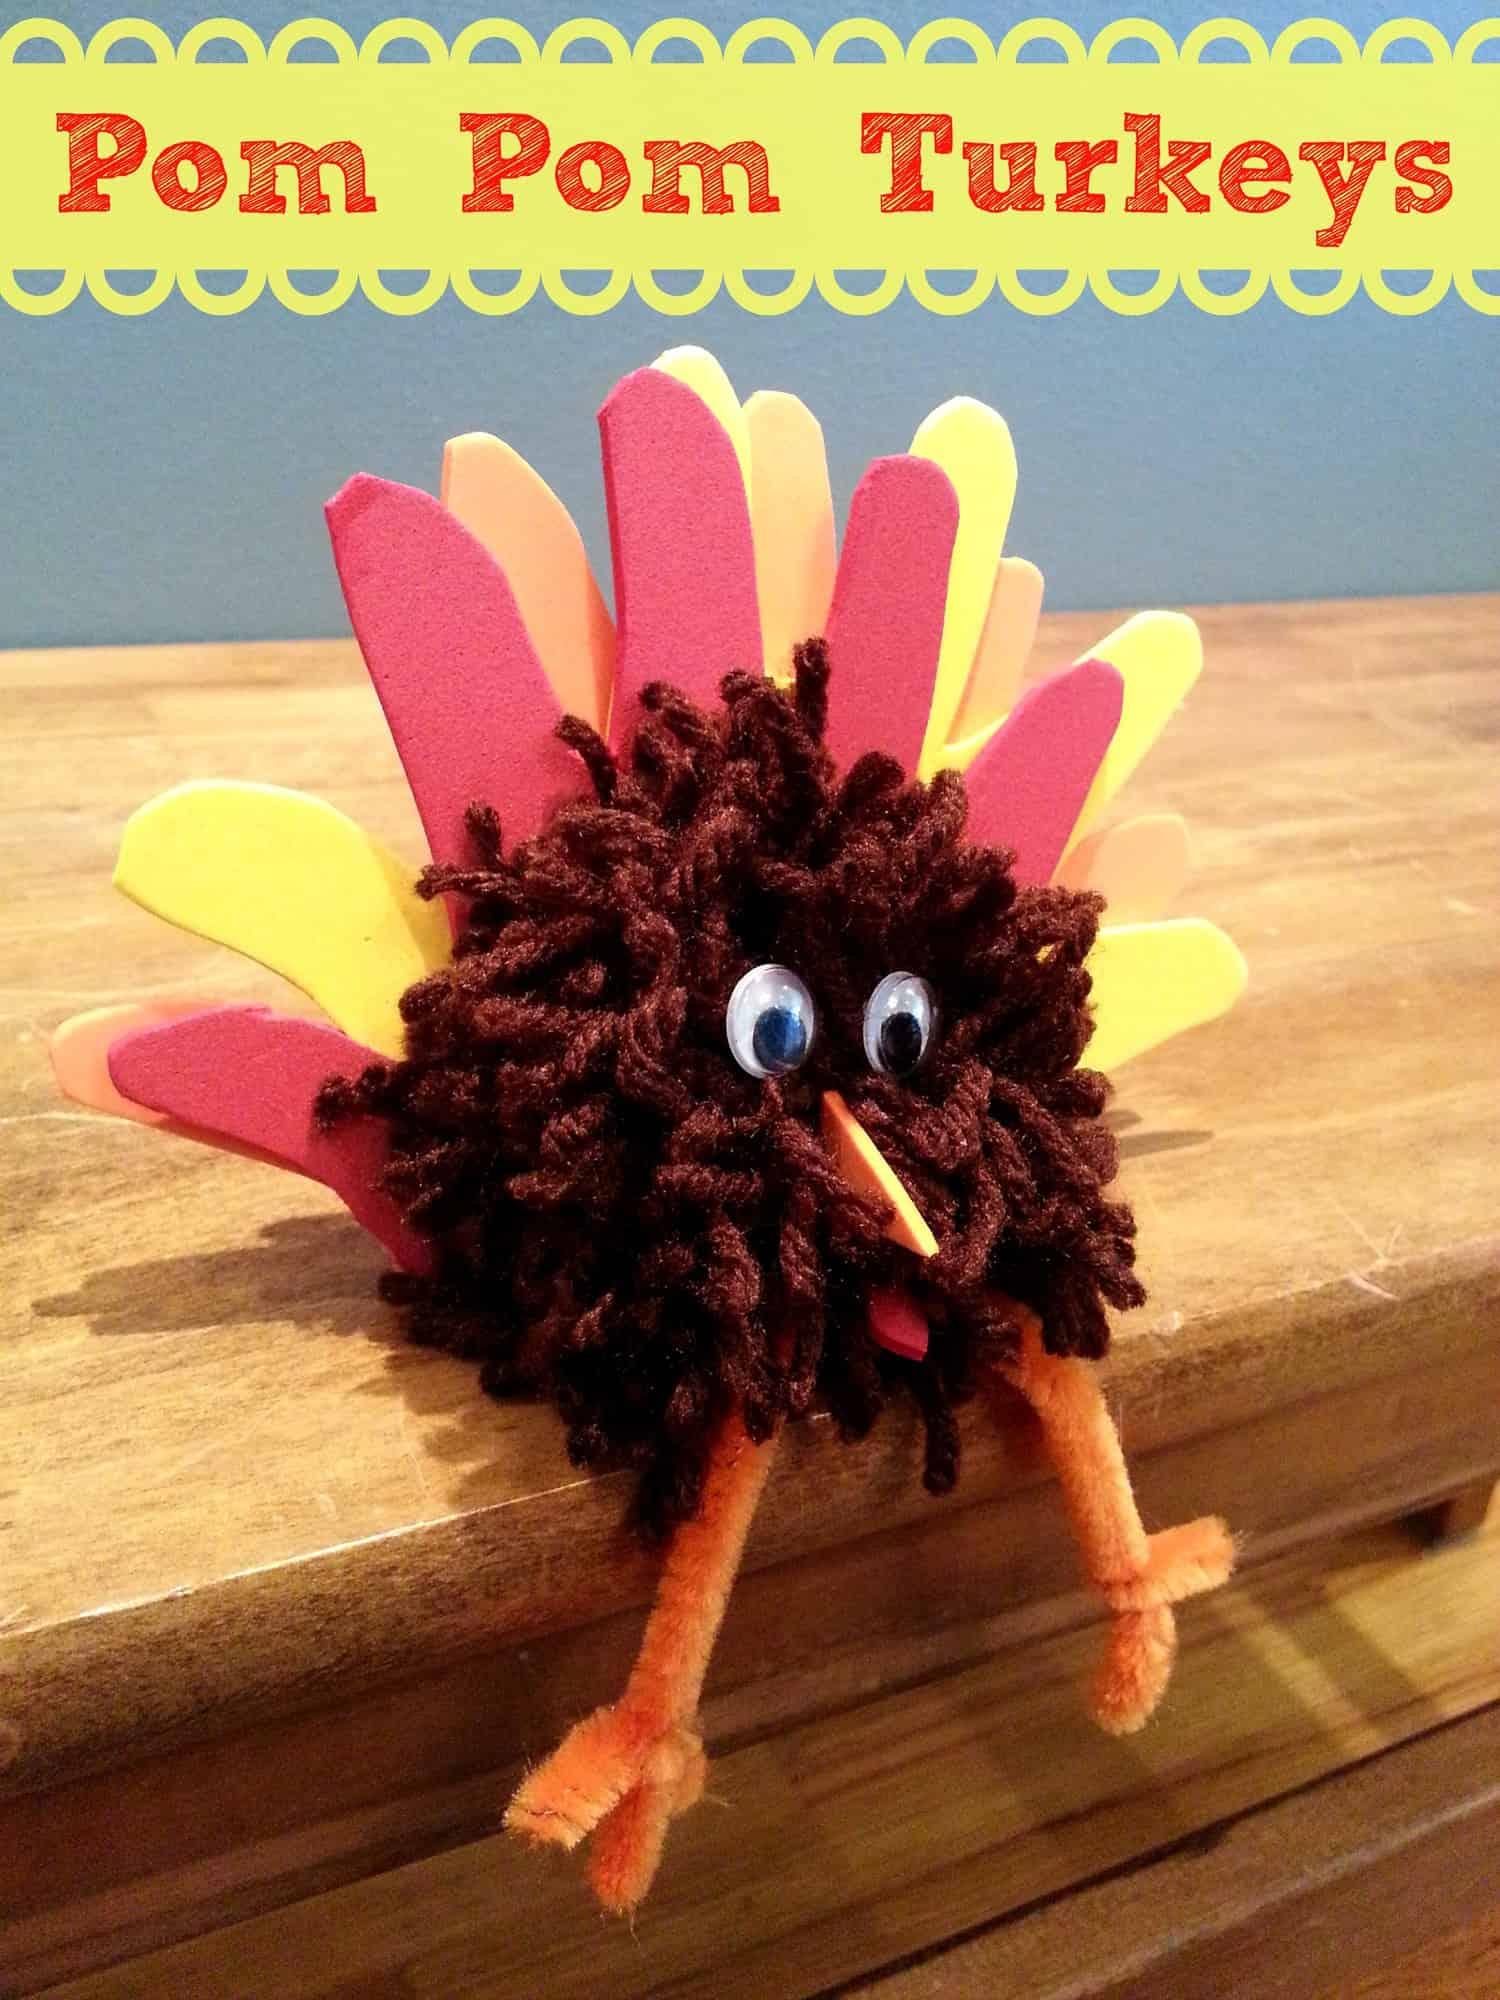 Easy thanksgiving craft pom pom turkeys via littlemisskate.ca